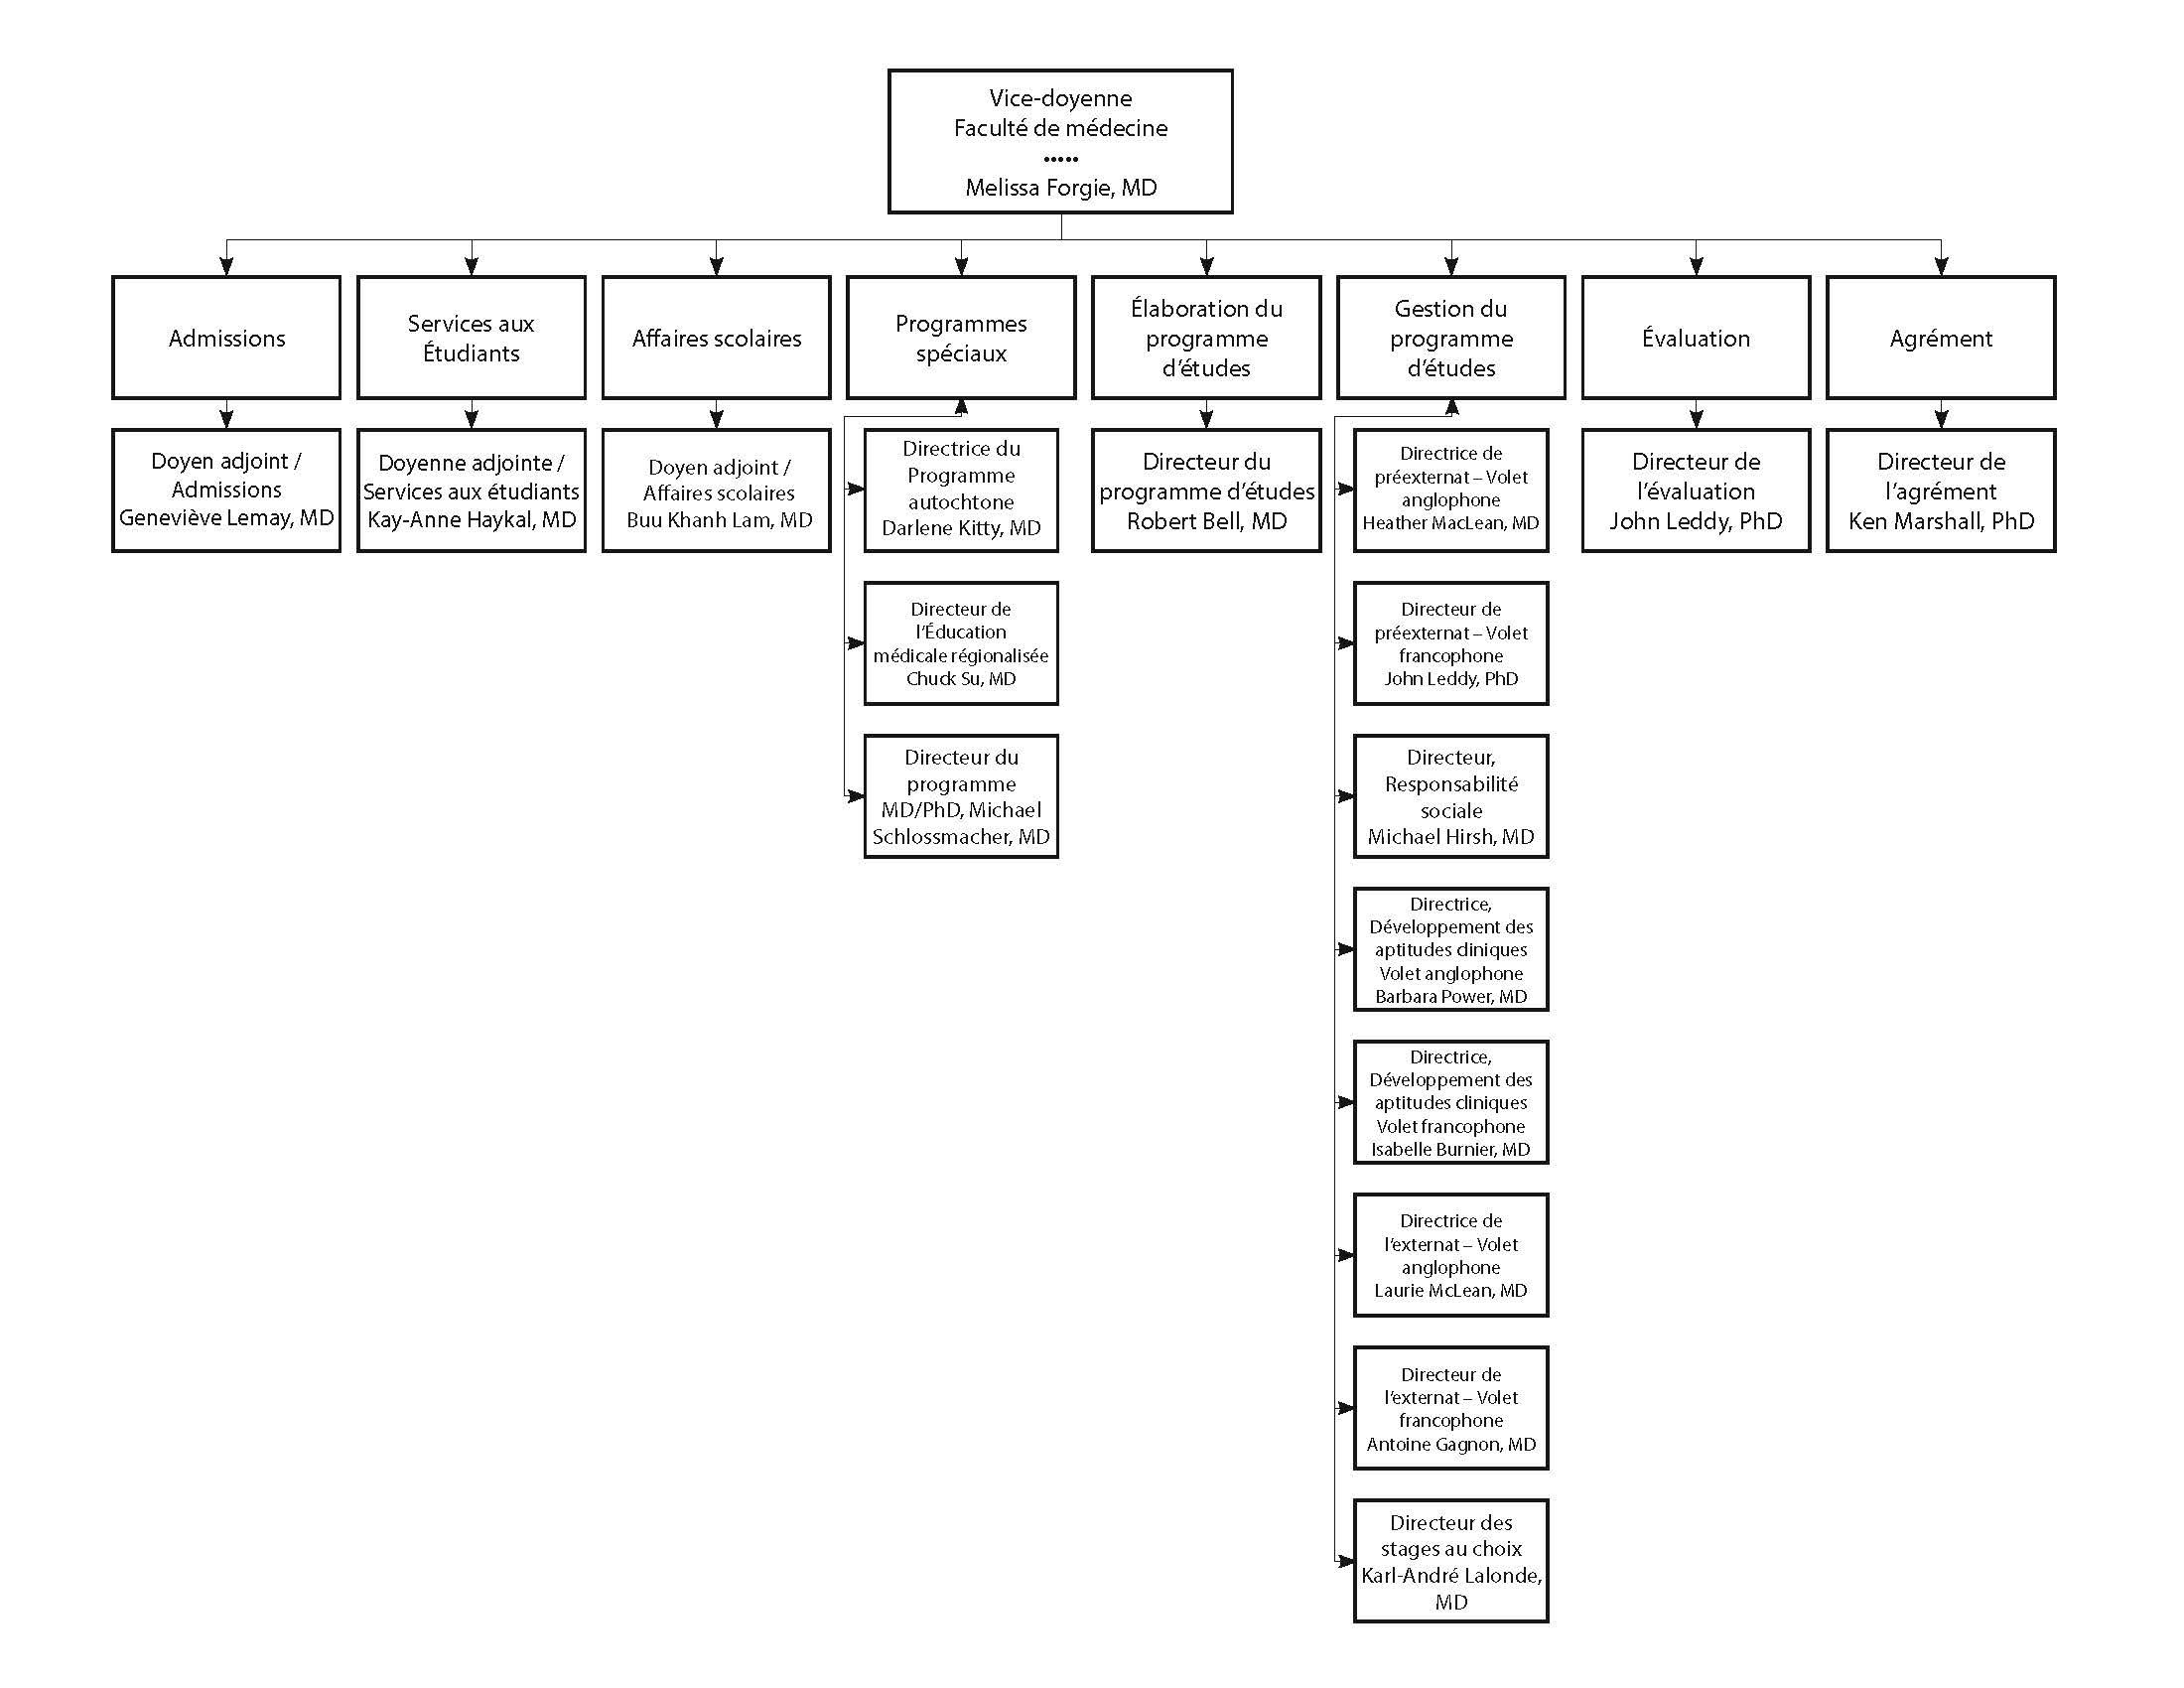 Organigramme - Responsables du programme d'études